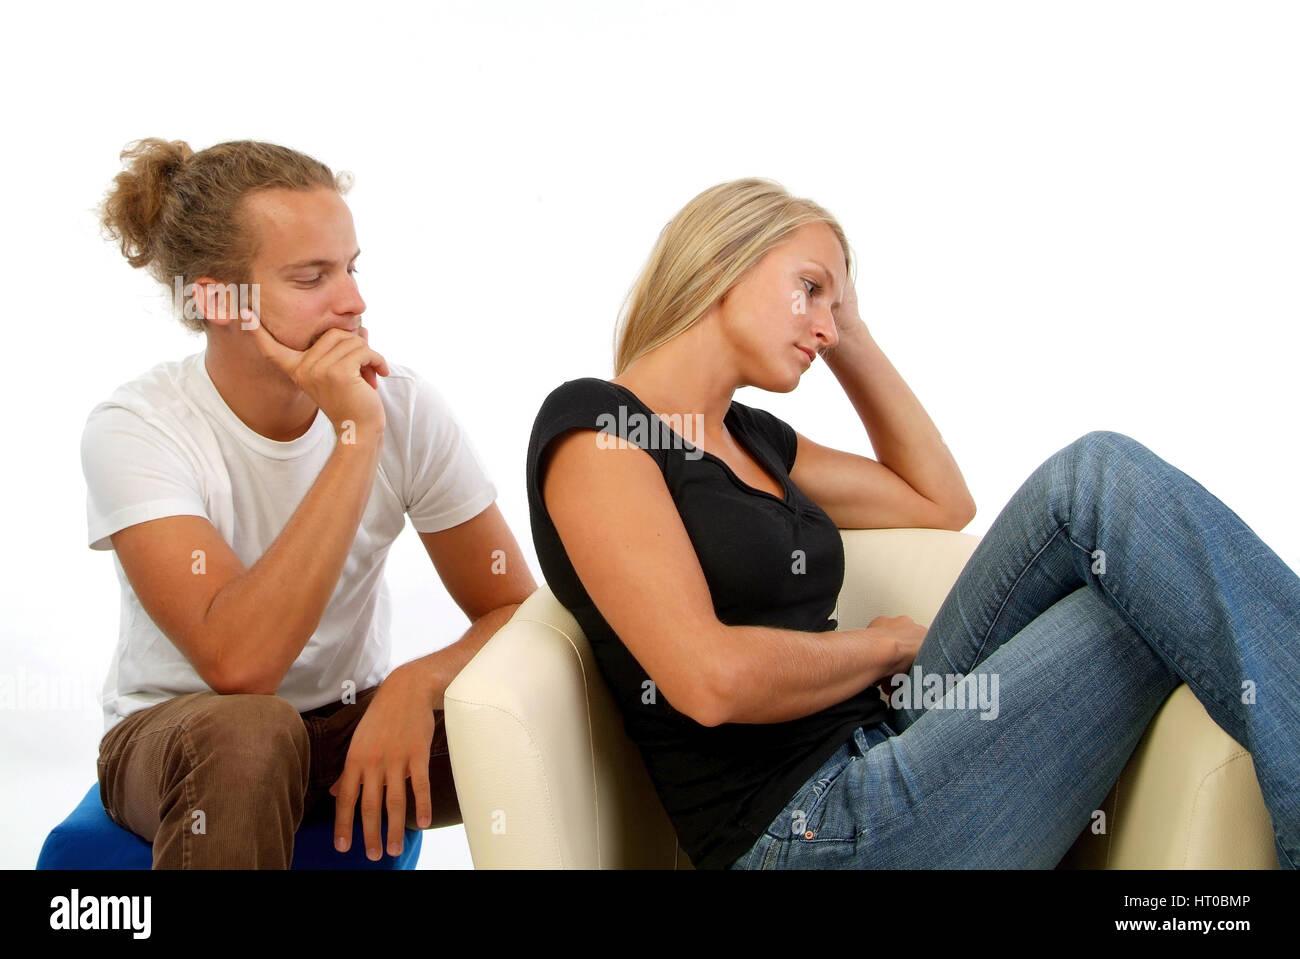 Symbolbild Beziehungsprobleme - symbolic for couple in crisis Stock Photo